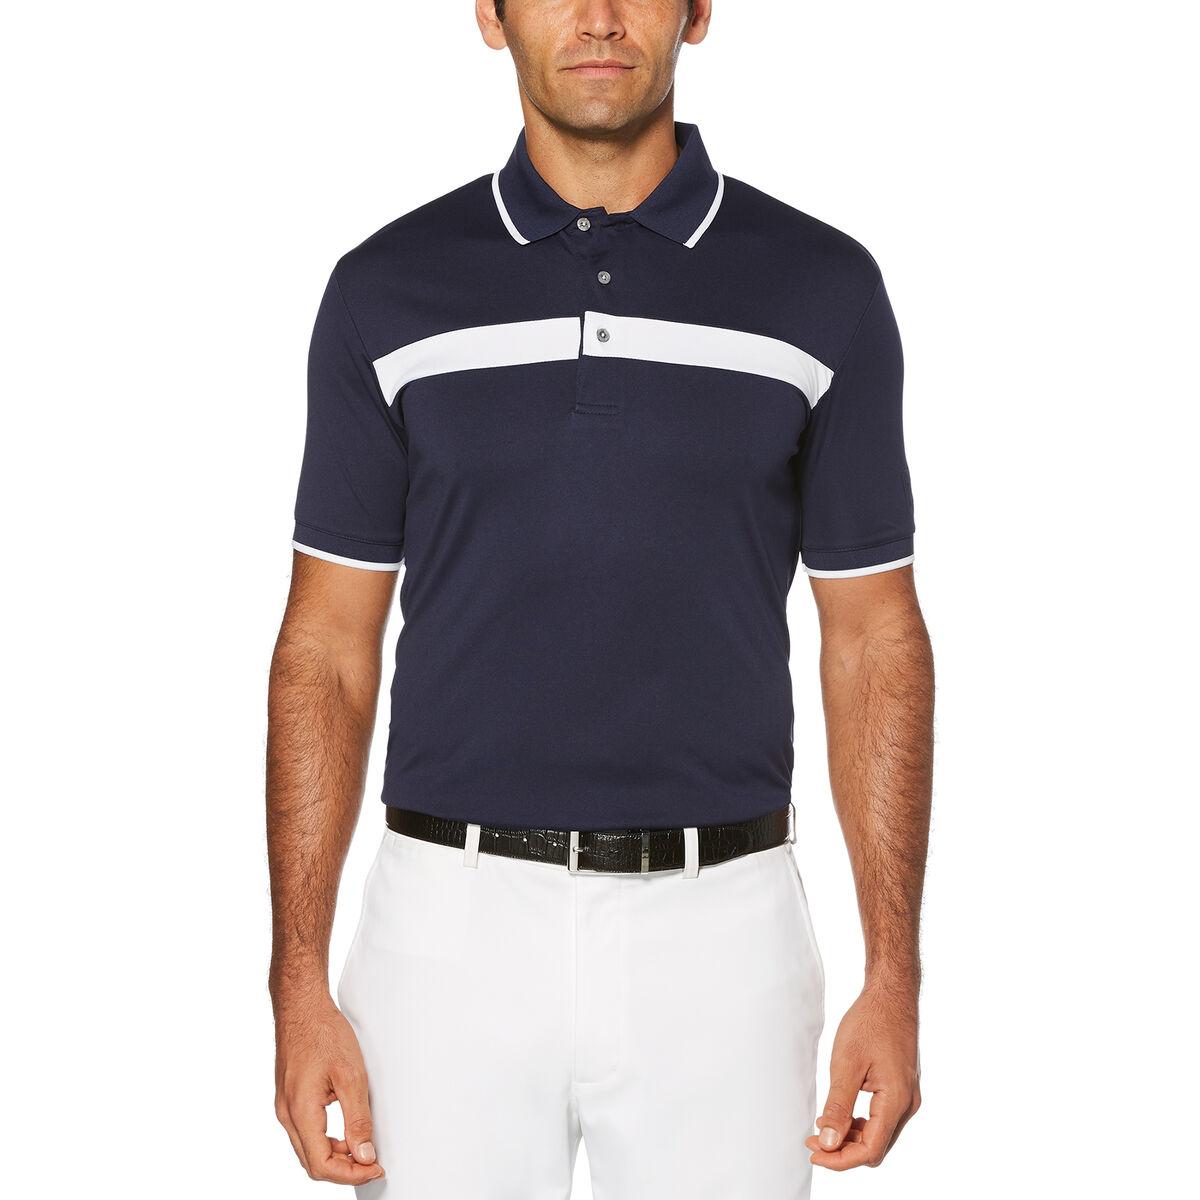 c3979ec6d Pga Tour Polo Shirts - DREAMWORKS